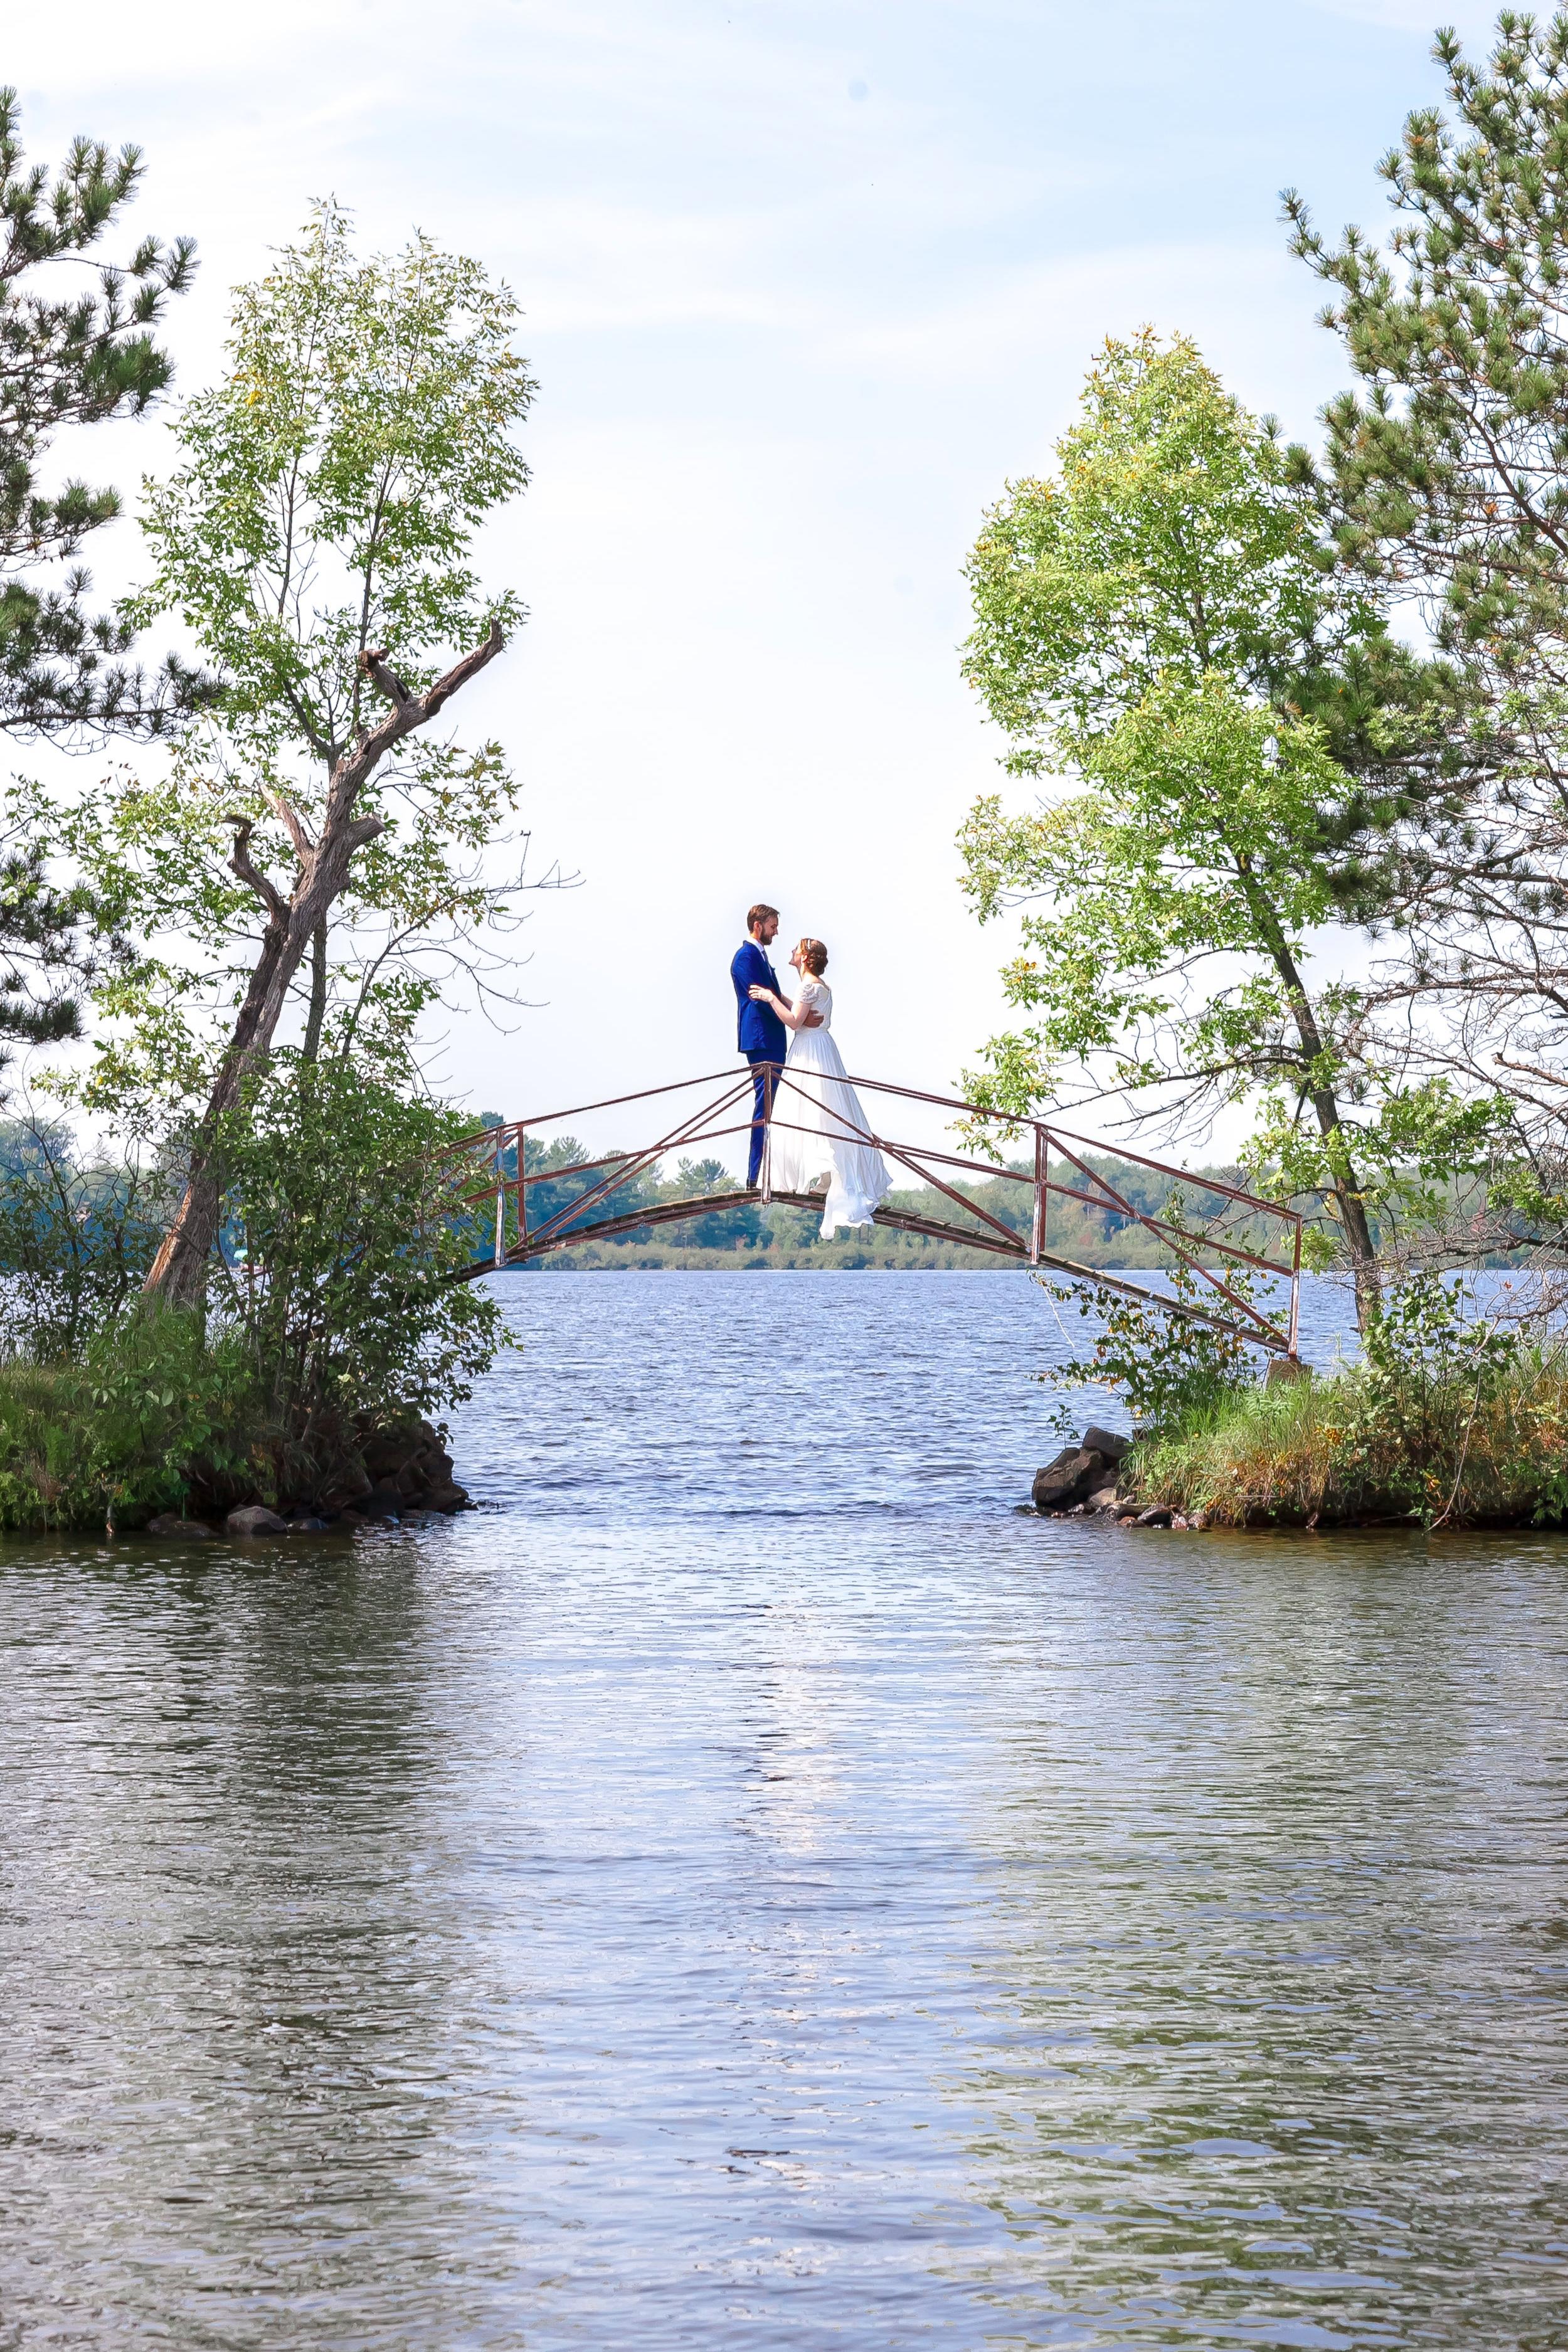 LILA_MATT_WISCONSIN_WEDDING_Copyright_jeremie_barlow_photography_2017+%28260+of+1179%29.jpg